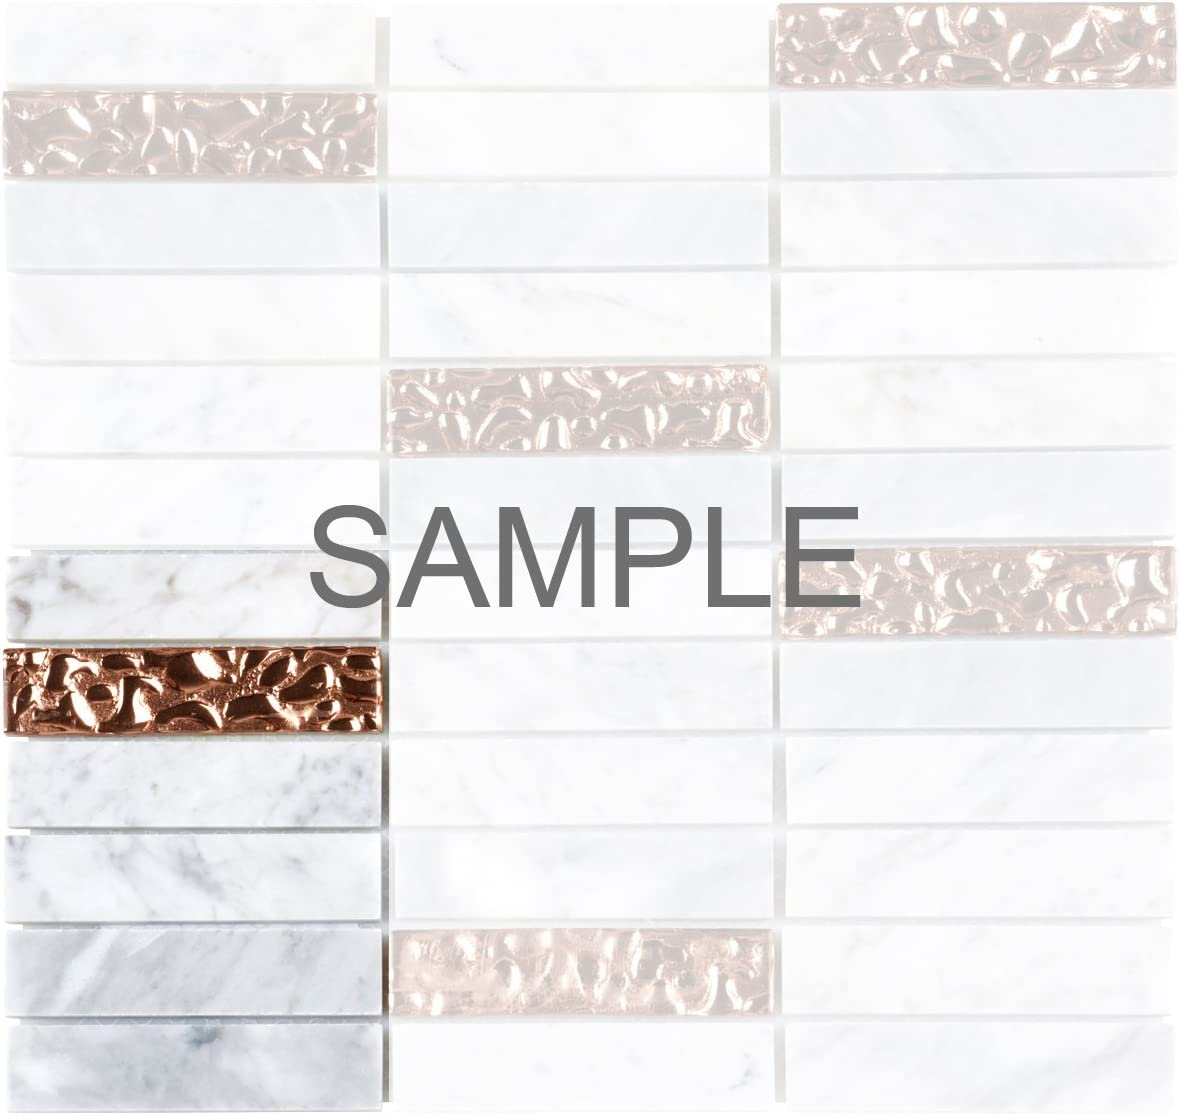 Rose Gold Glass Inserted Blend Stacked Pattern Backsplash Modket TDH142MO White Carrara Marble Stone Mosaic Tile